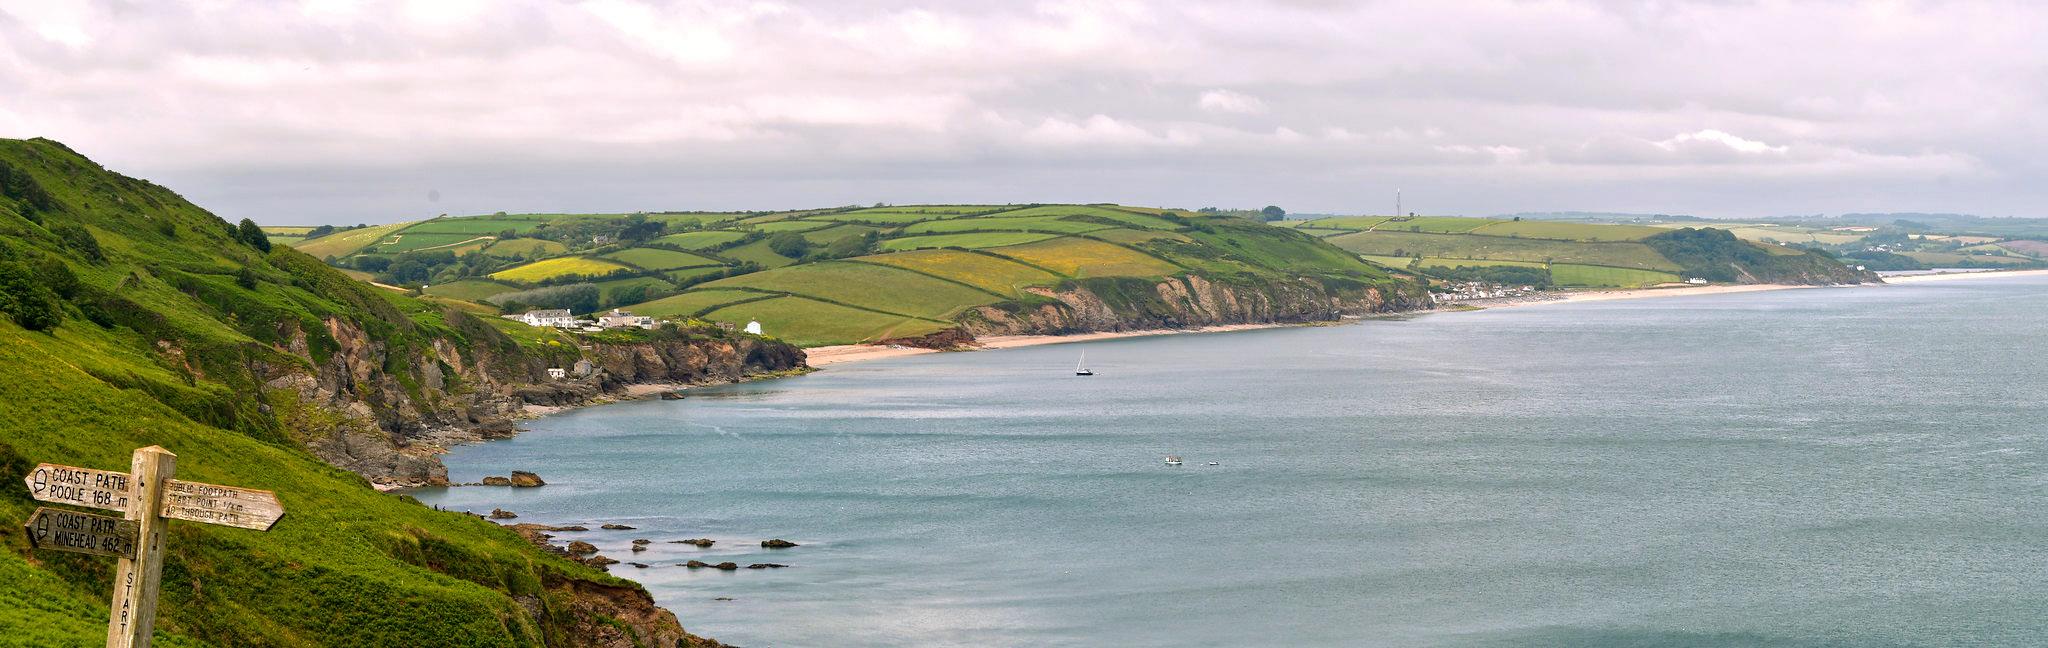 Start Point, Devon by Phil Eptlett.jpg